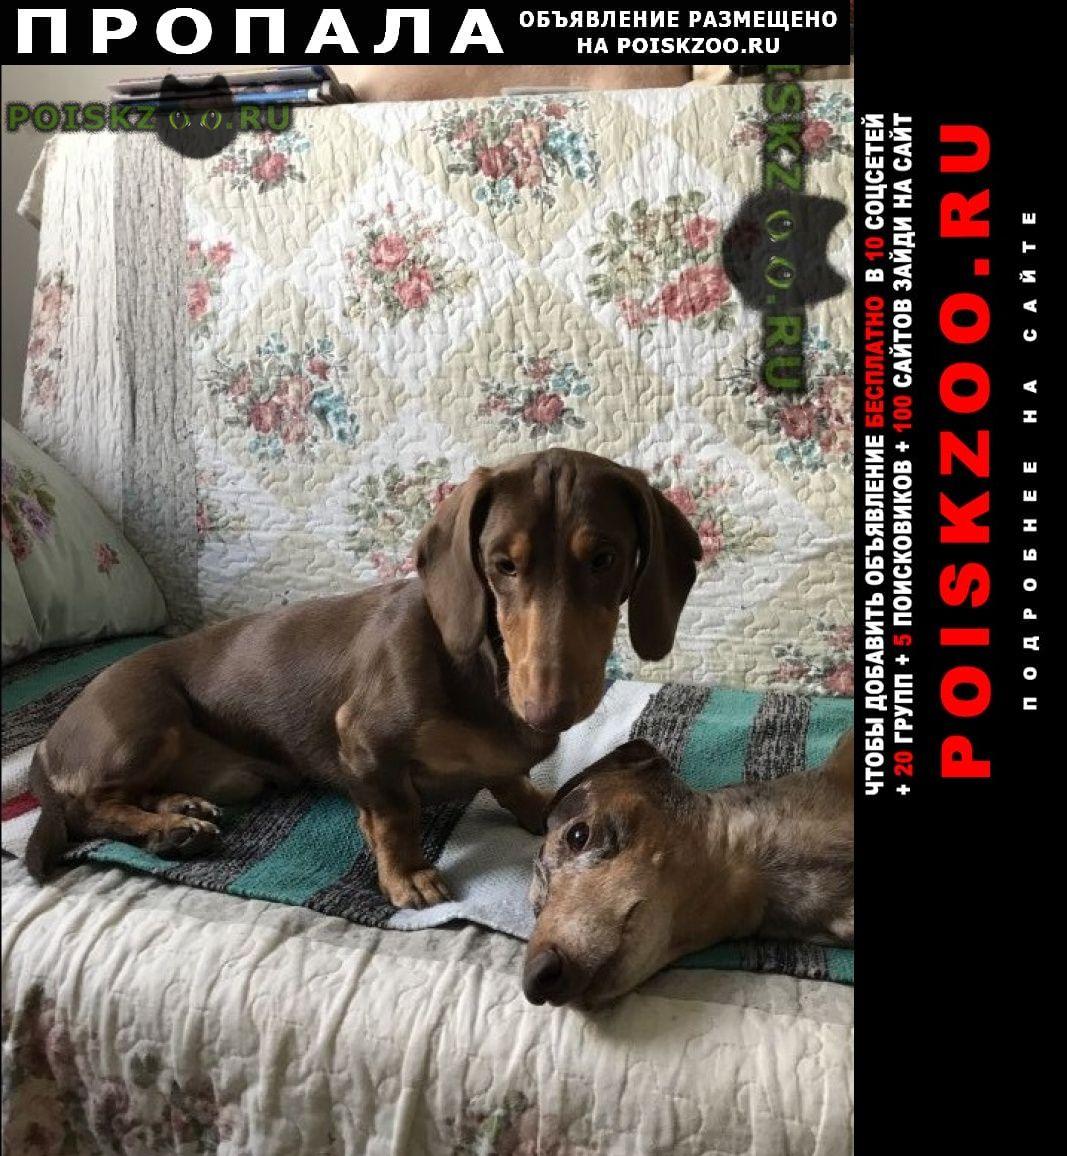 Пропала собака кобель г.Немчиновка